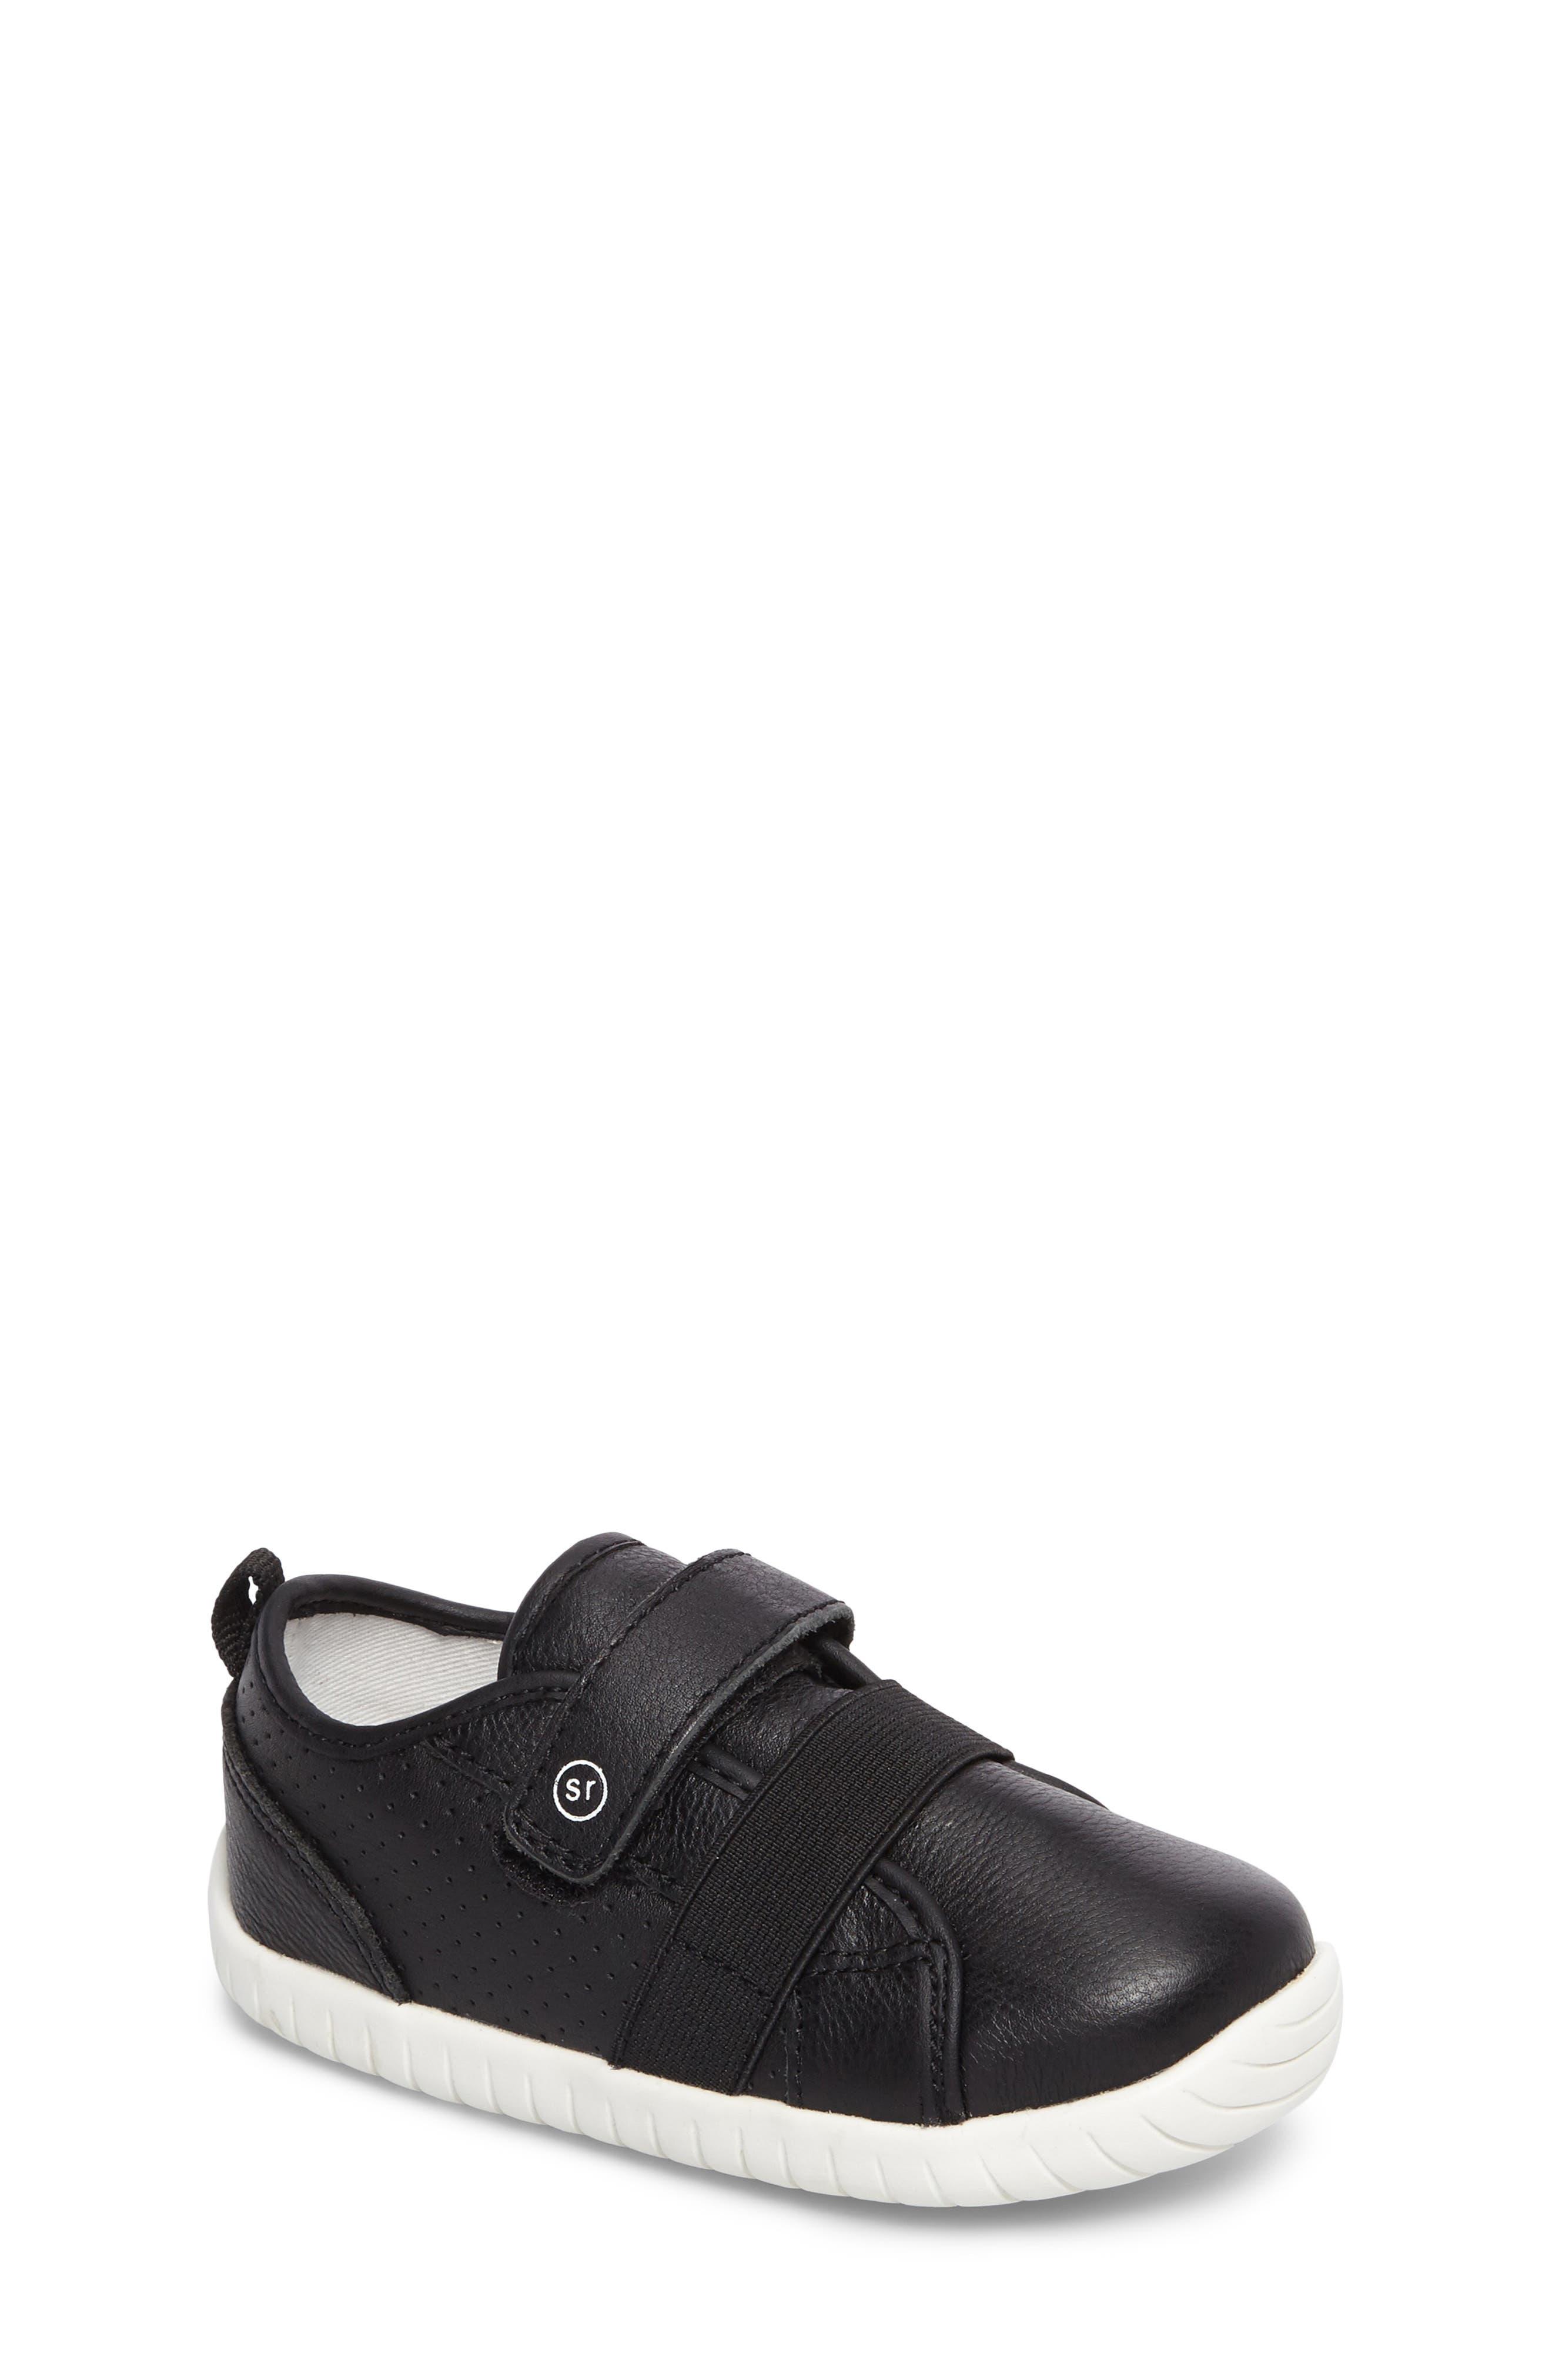 SRT Riley Sneaker,                             Main thumbnail 1, color,                             Black Leather